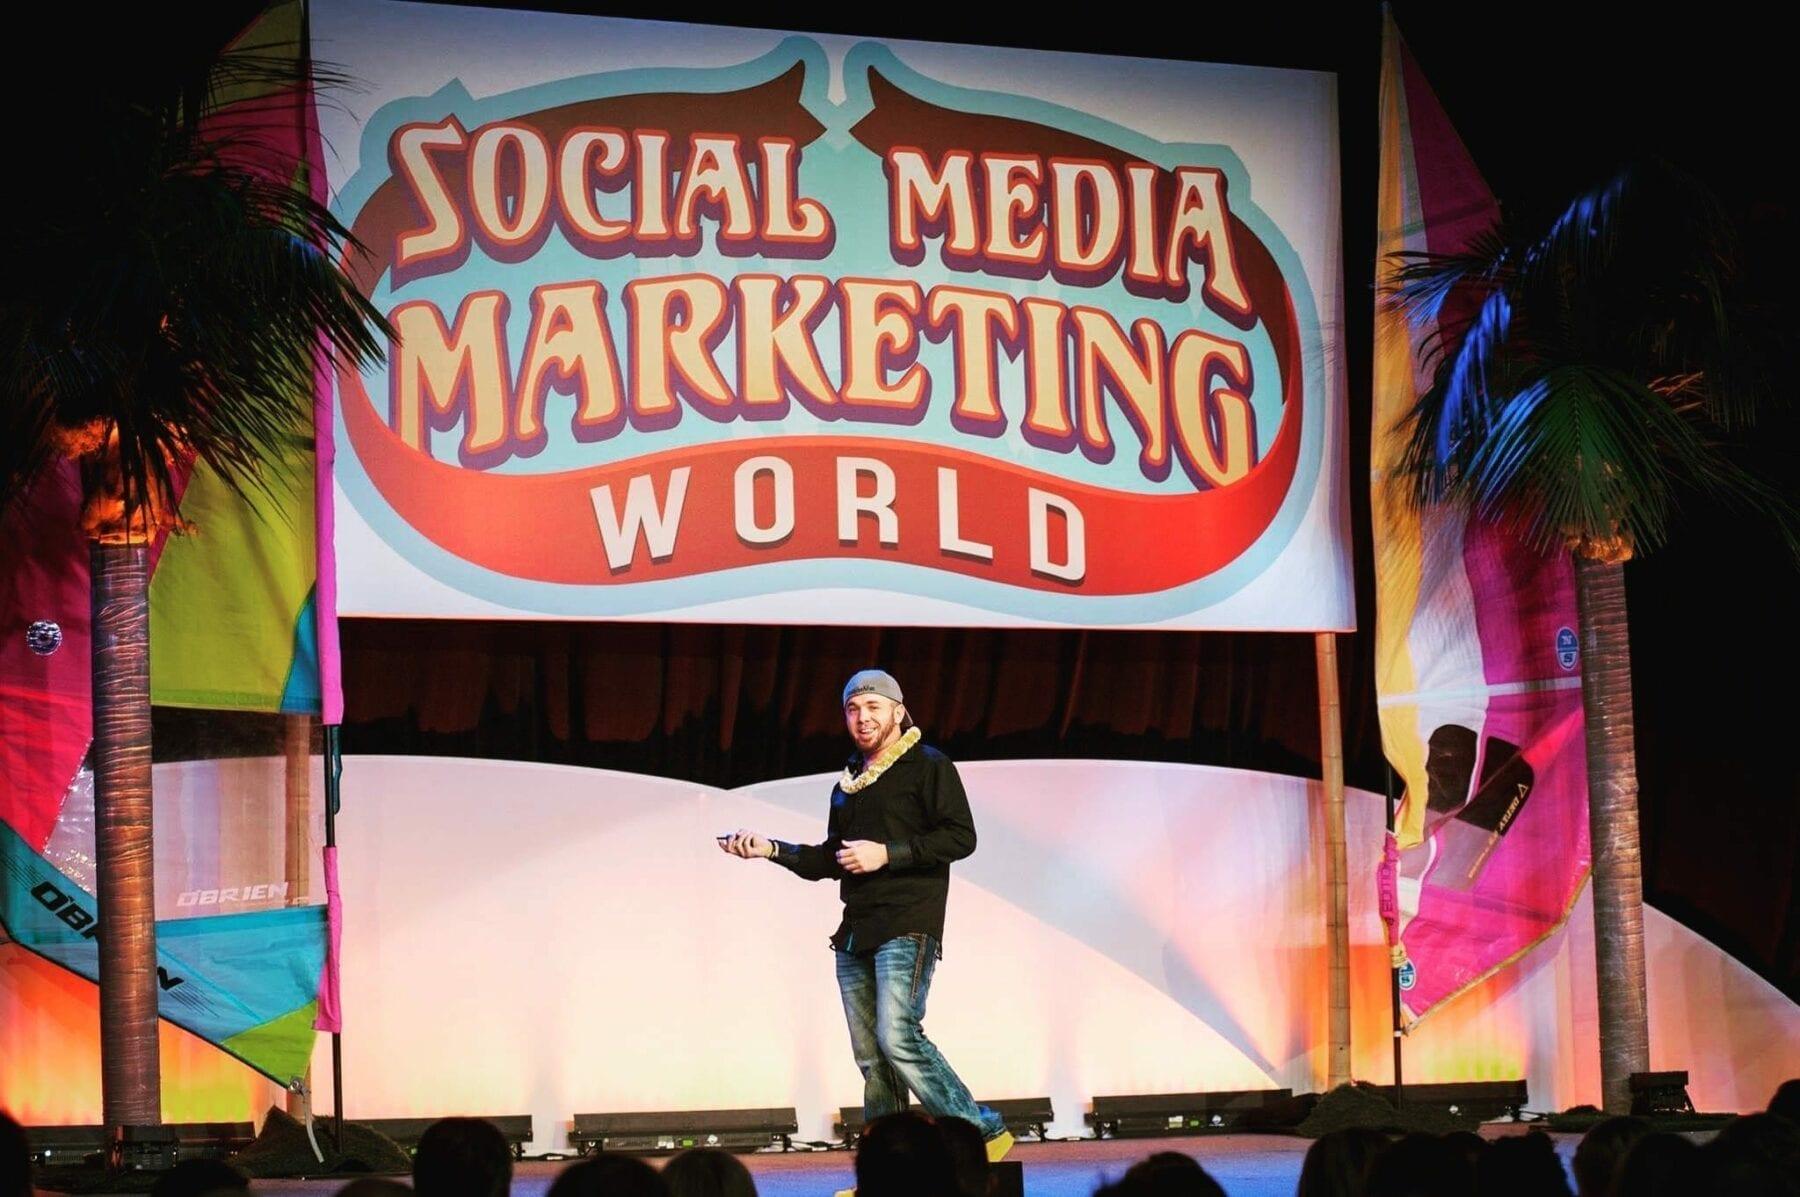 Social Media Marketing World Keynote Speaker Brian Fanzo